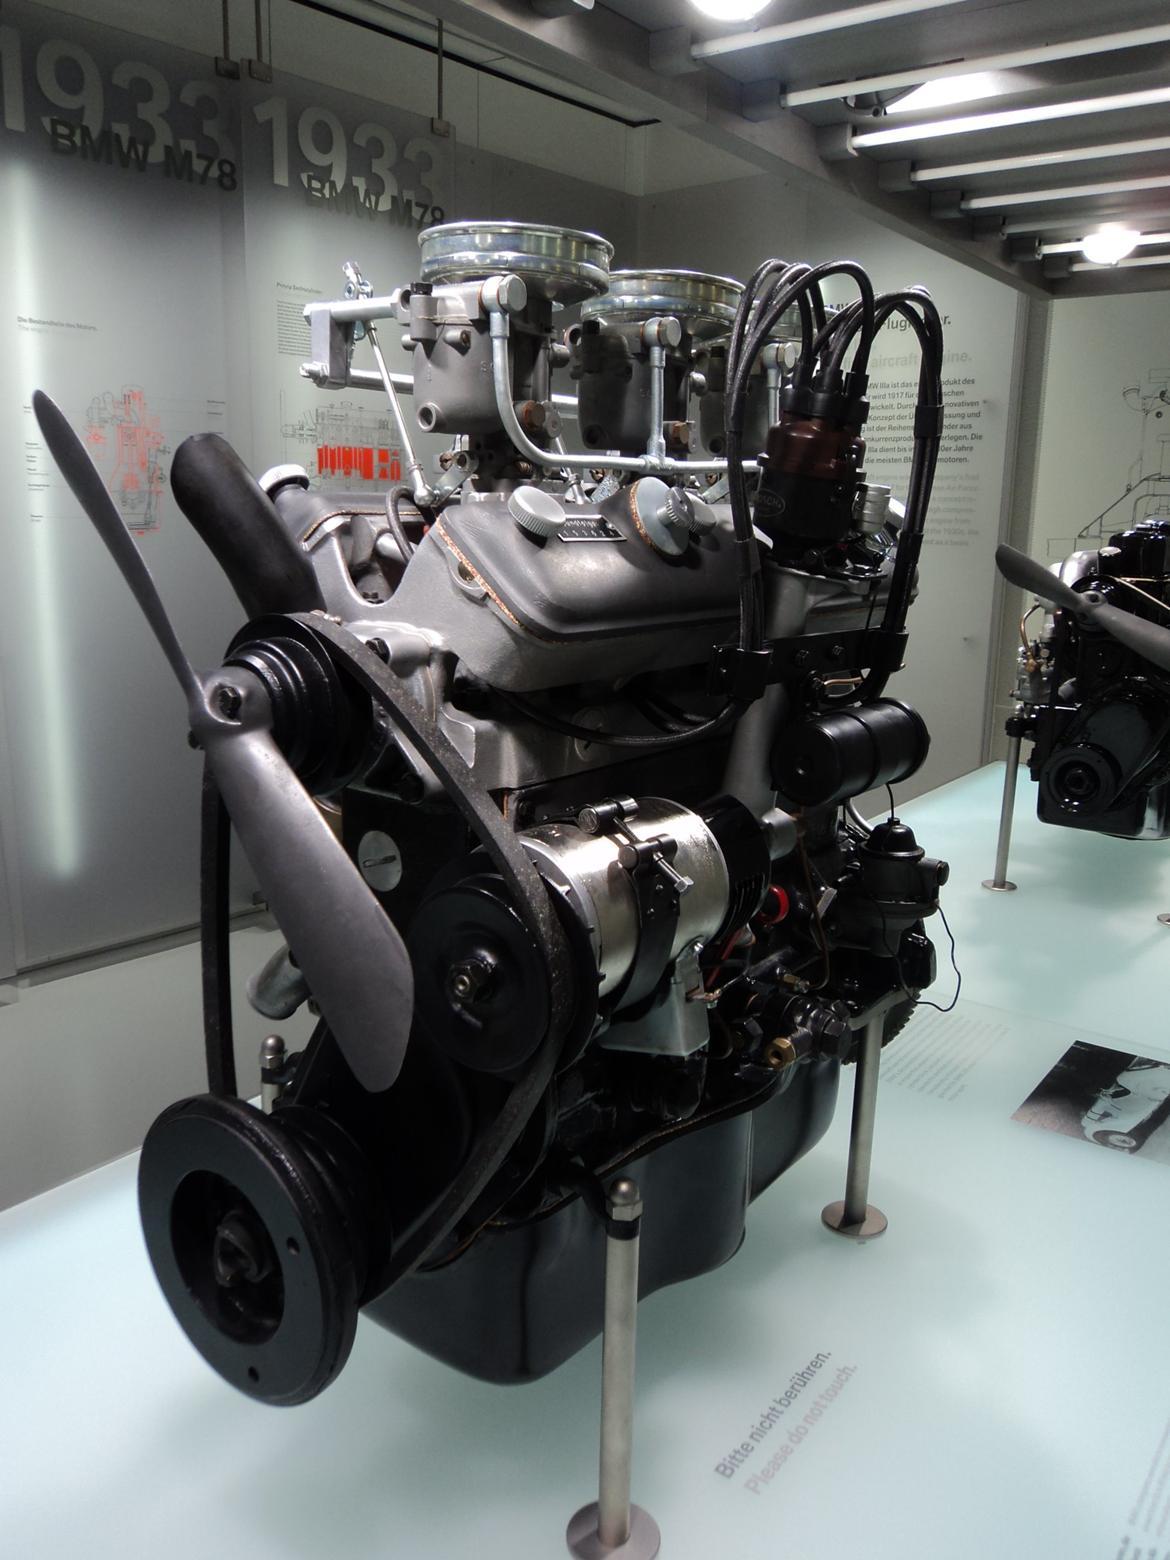 BMW Welt museum i München 2015 billede 229